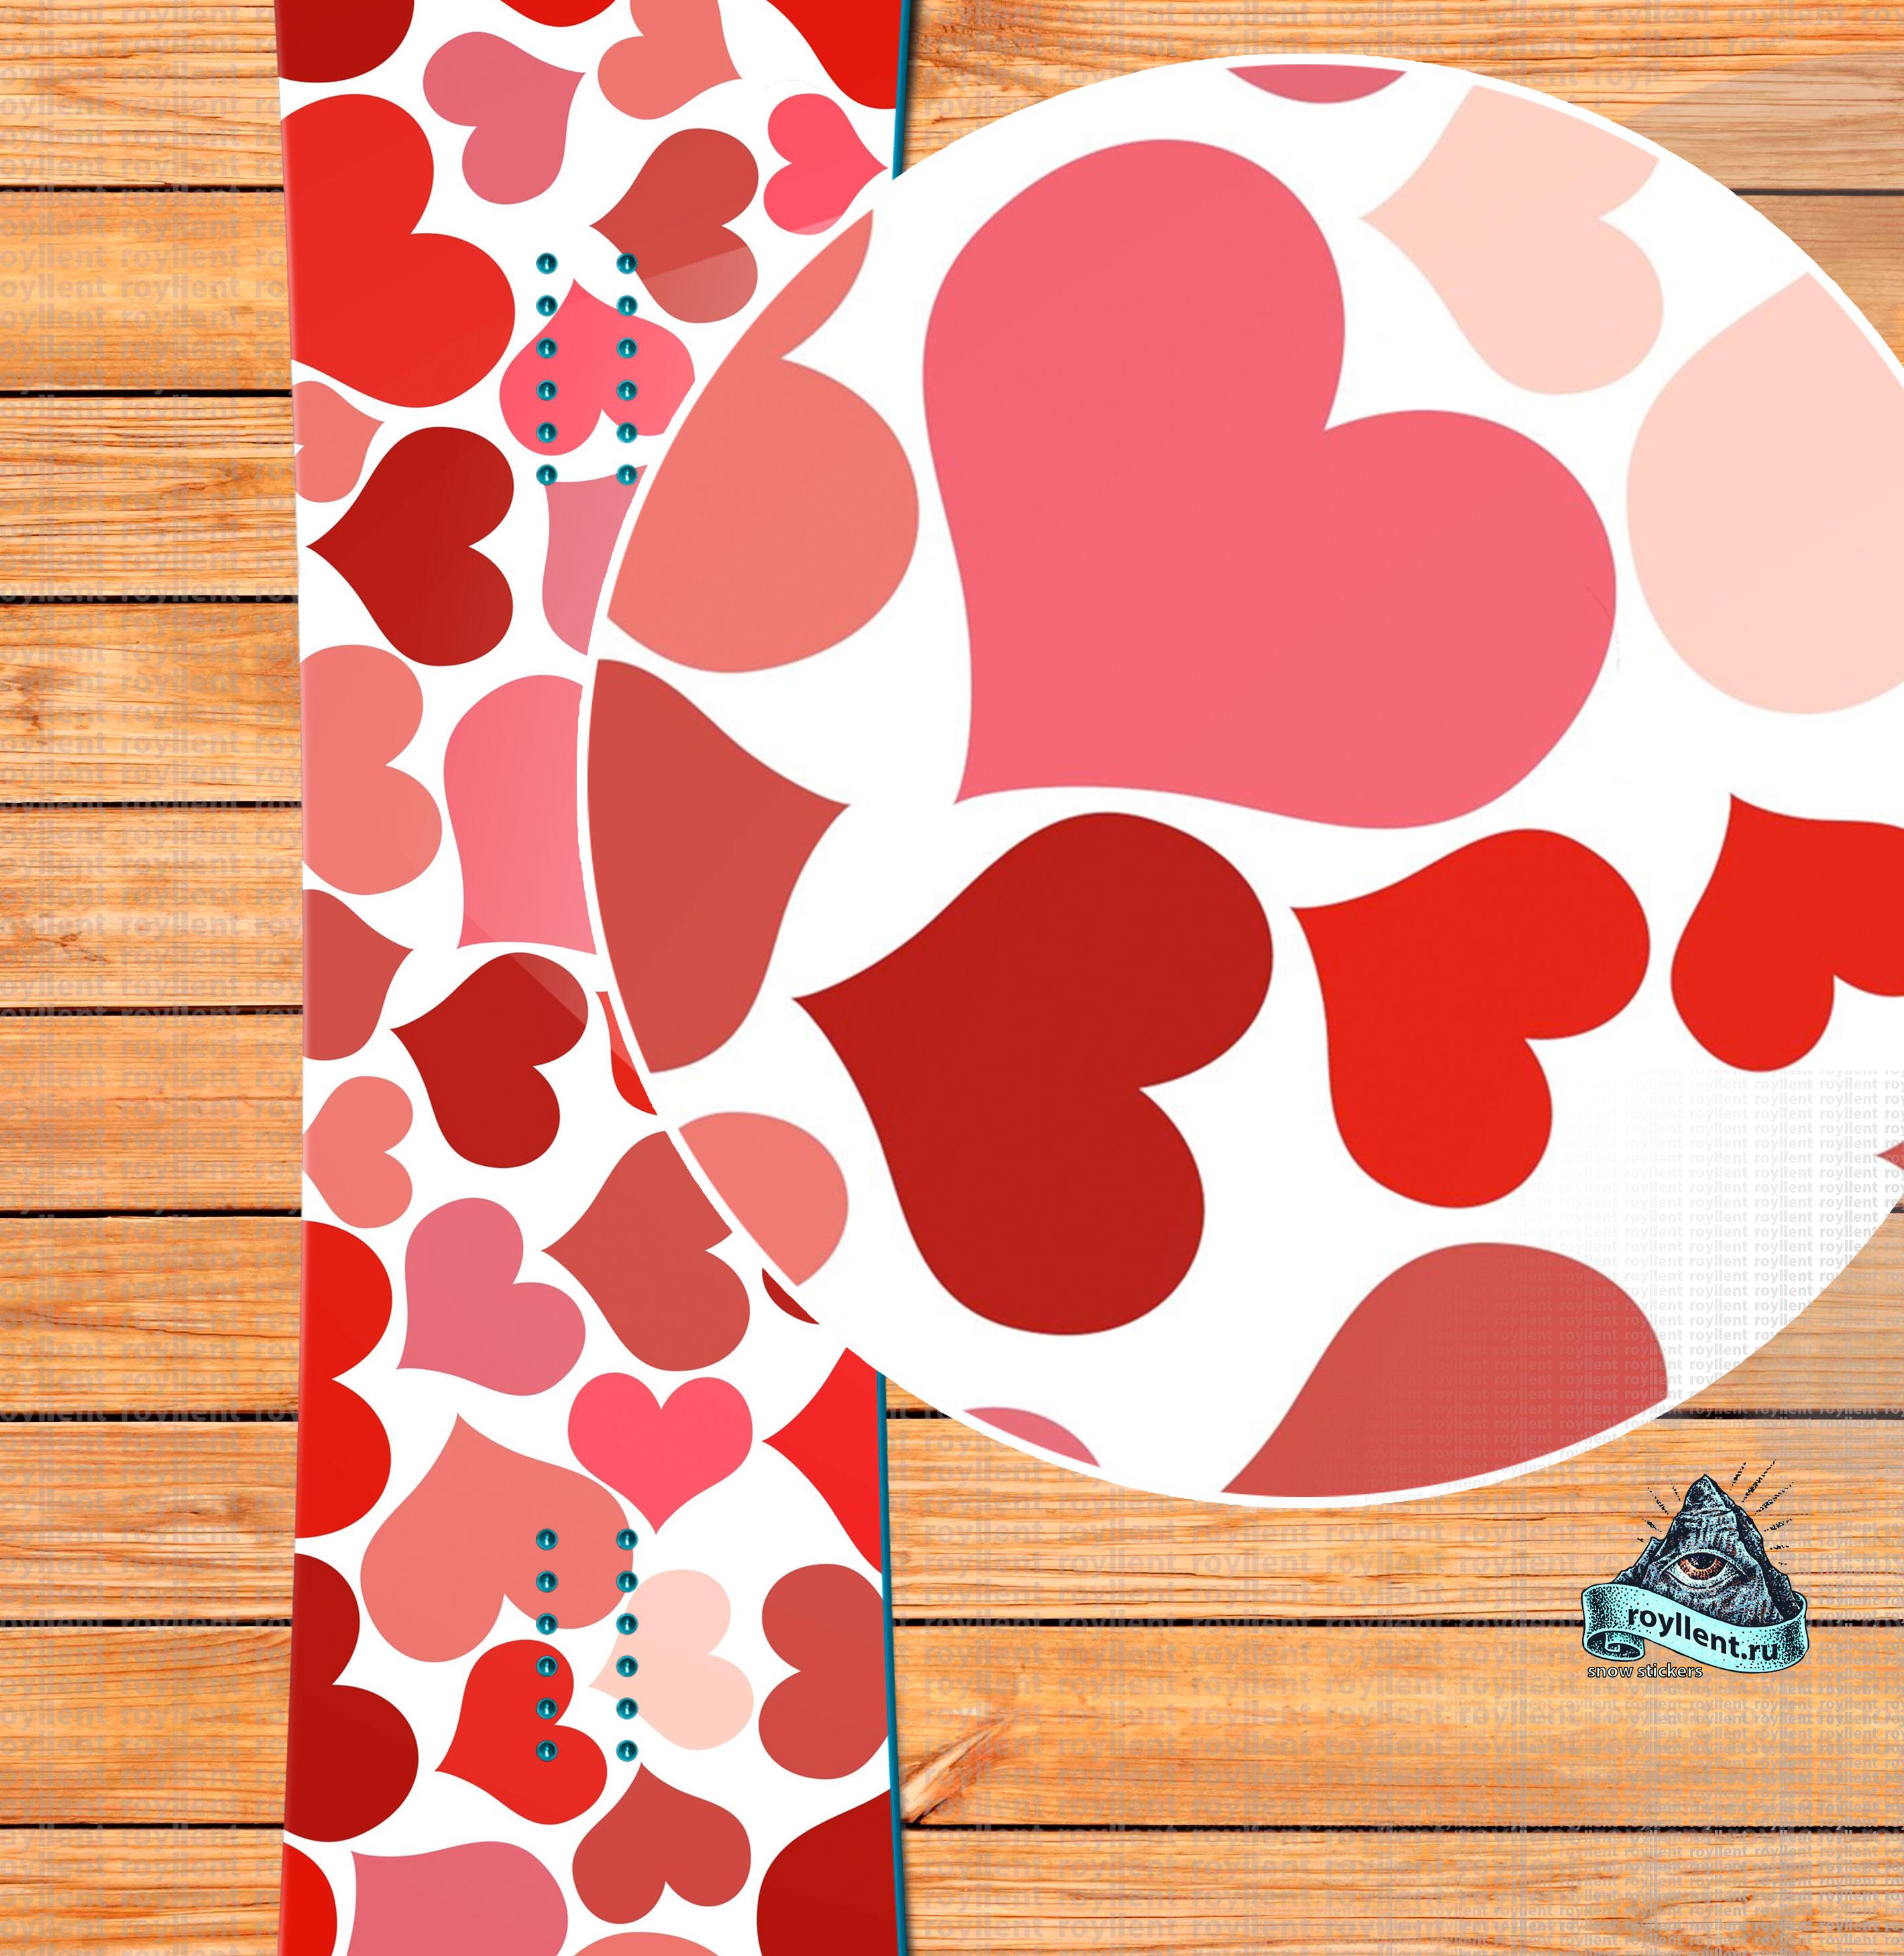 snowboard sticker, Abstract Heart Shape Artistic Snowboard Sticker, наклейка на доску, сноуборд стикер, полноразмерная наклейка на сноуборд, сноуборд стикер на доску, купить стике, стикер на сноуборд, заказать рисунок на доску, принт на сноуборд, наклейка